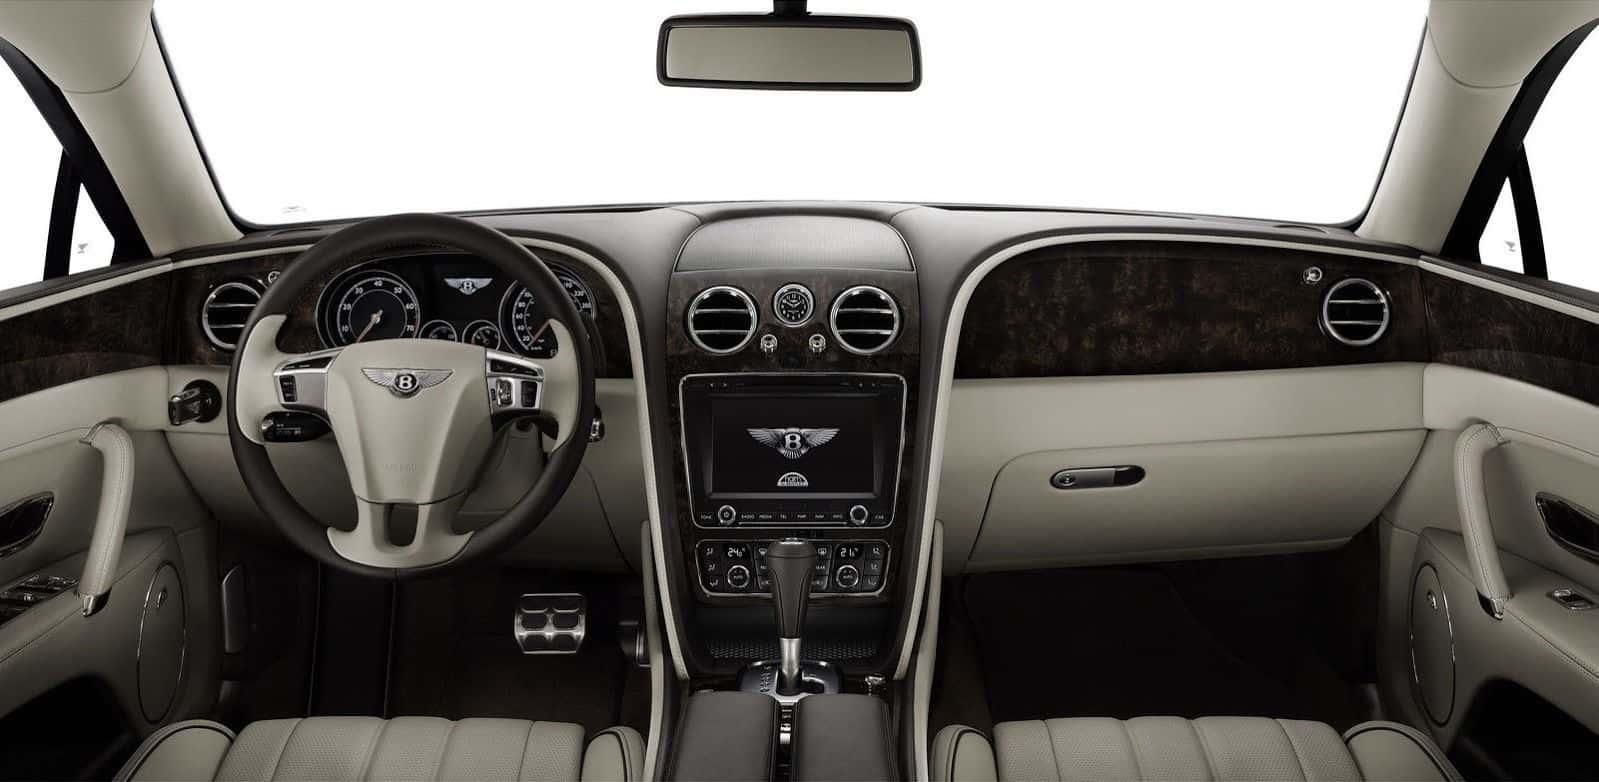 2014 Bentley Flying Spur Dashboard